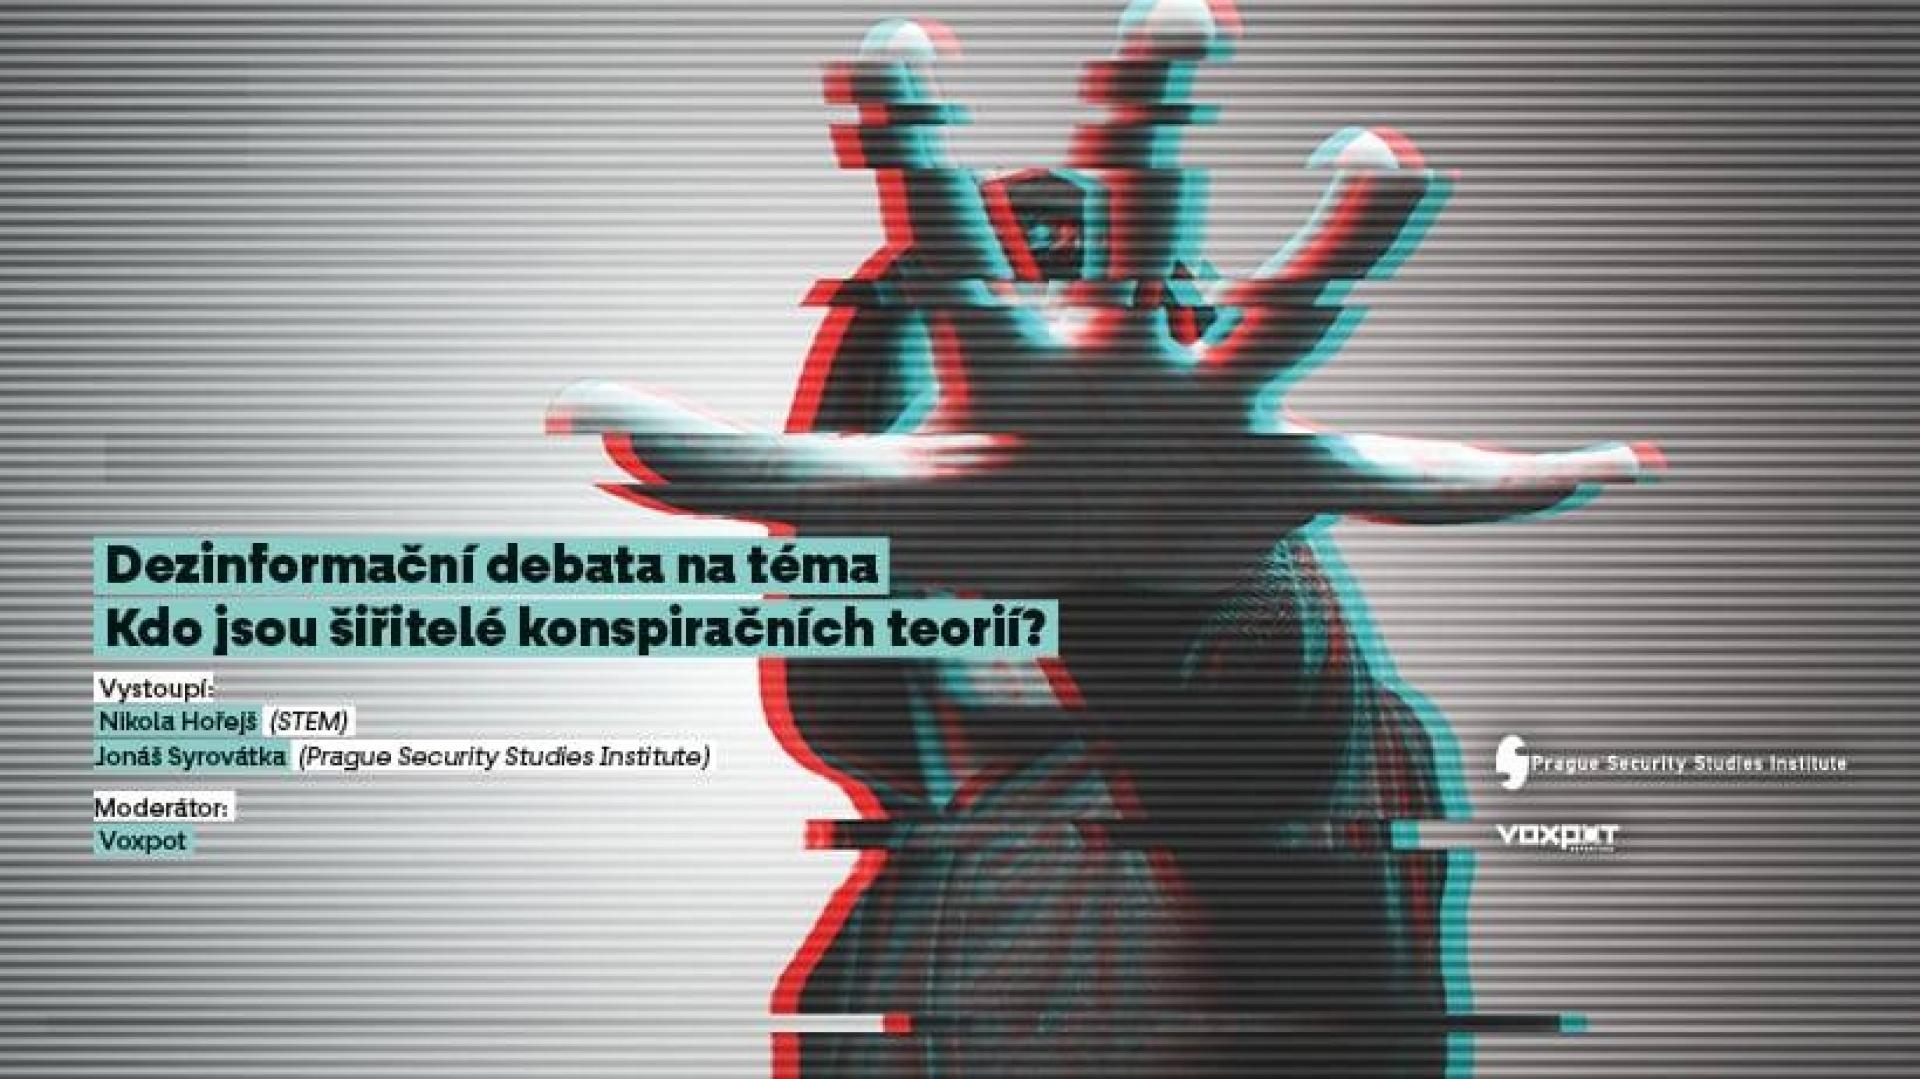 Deziformační debata 03